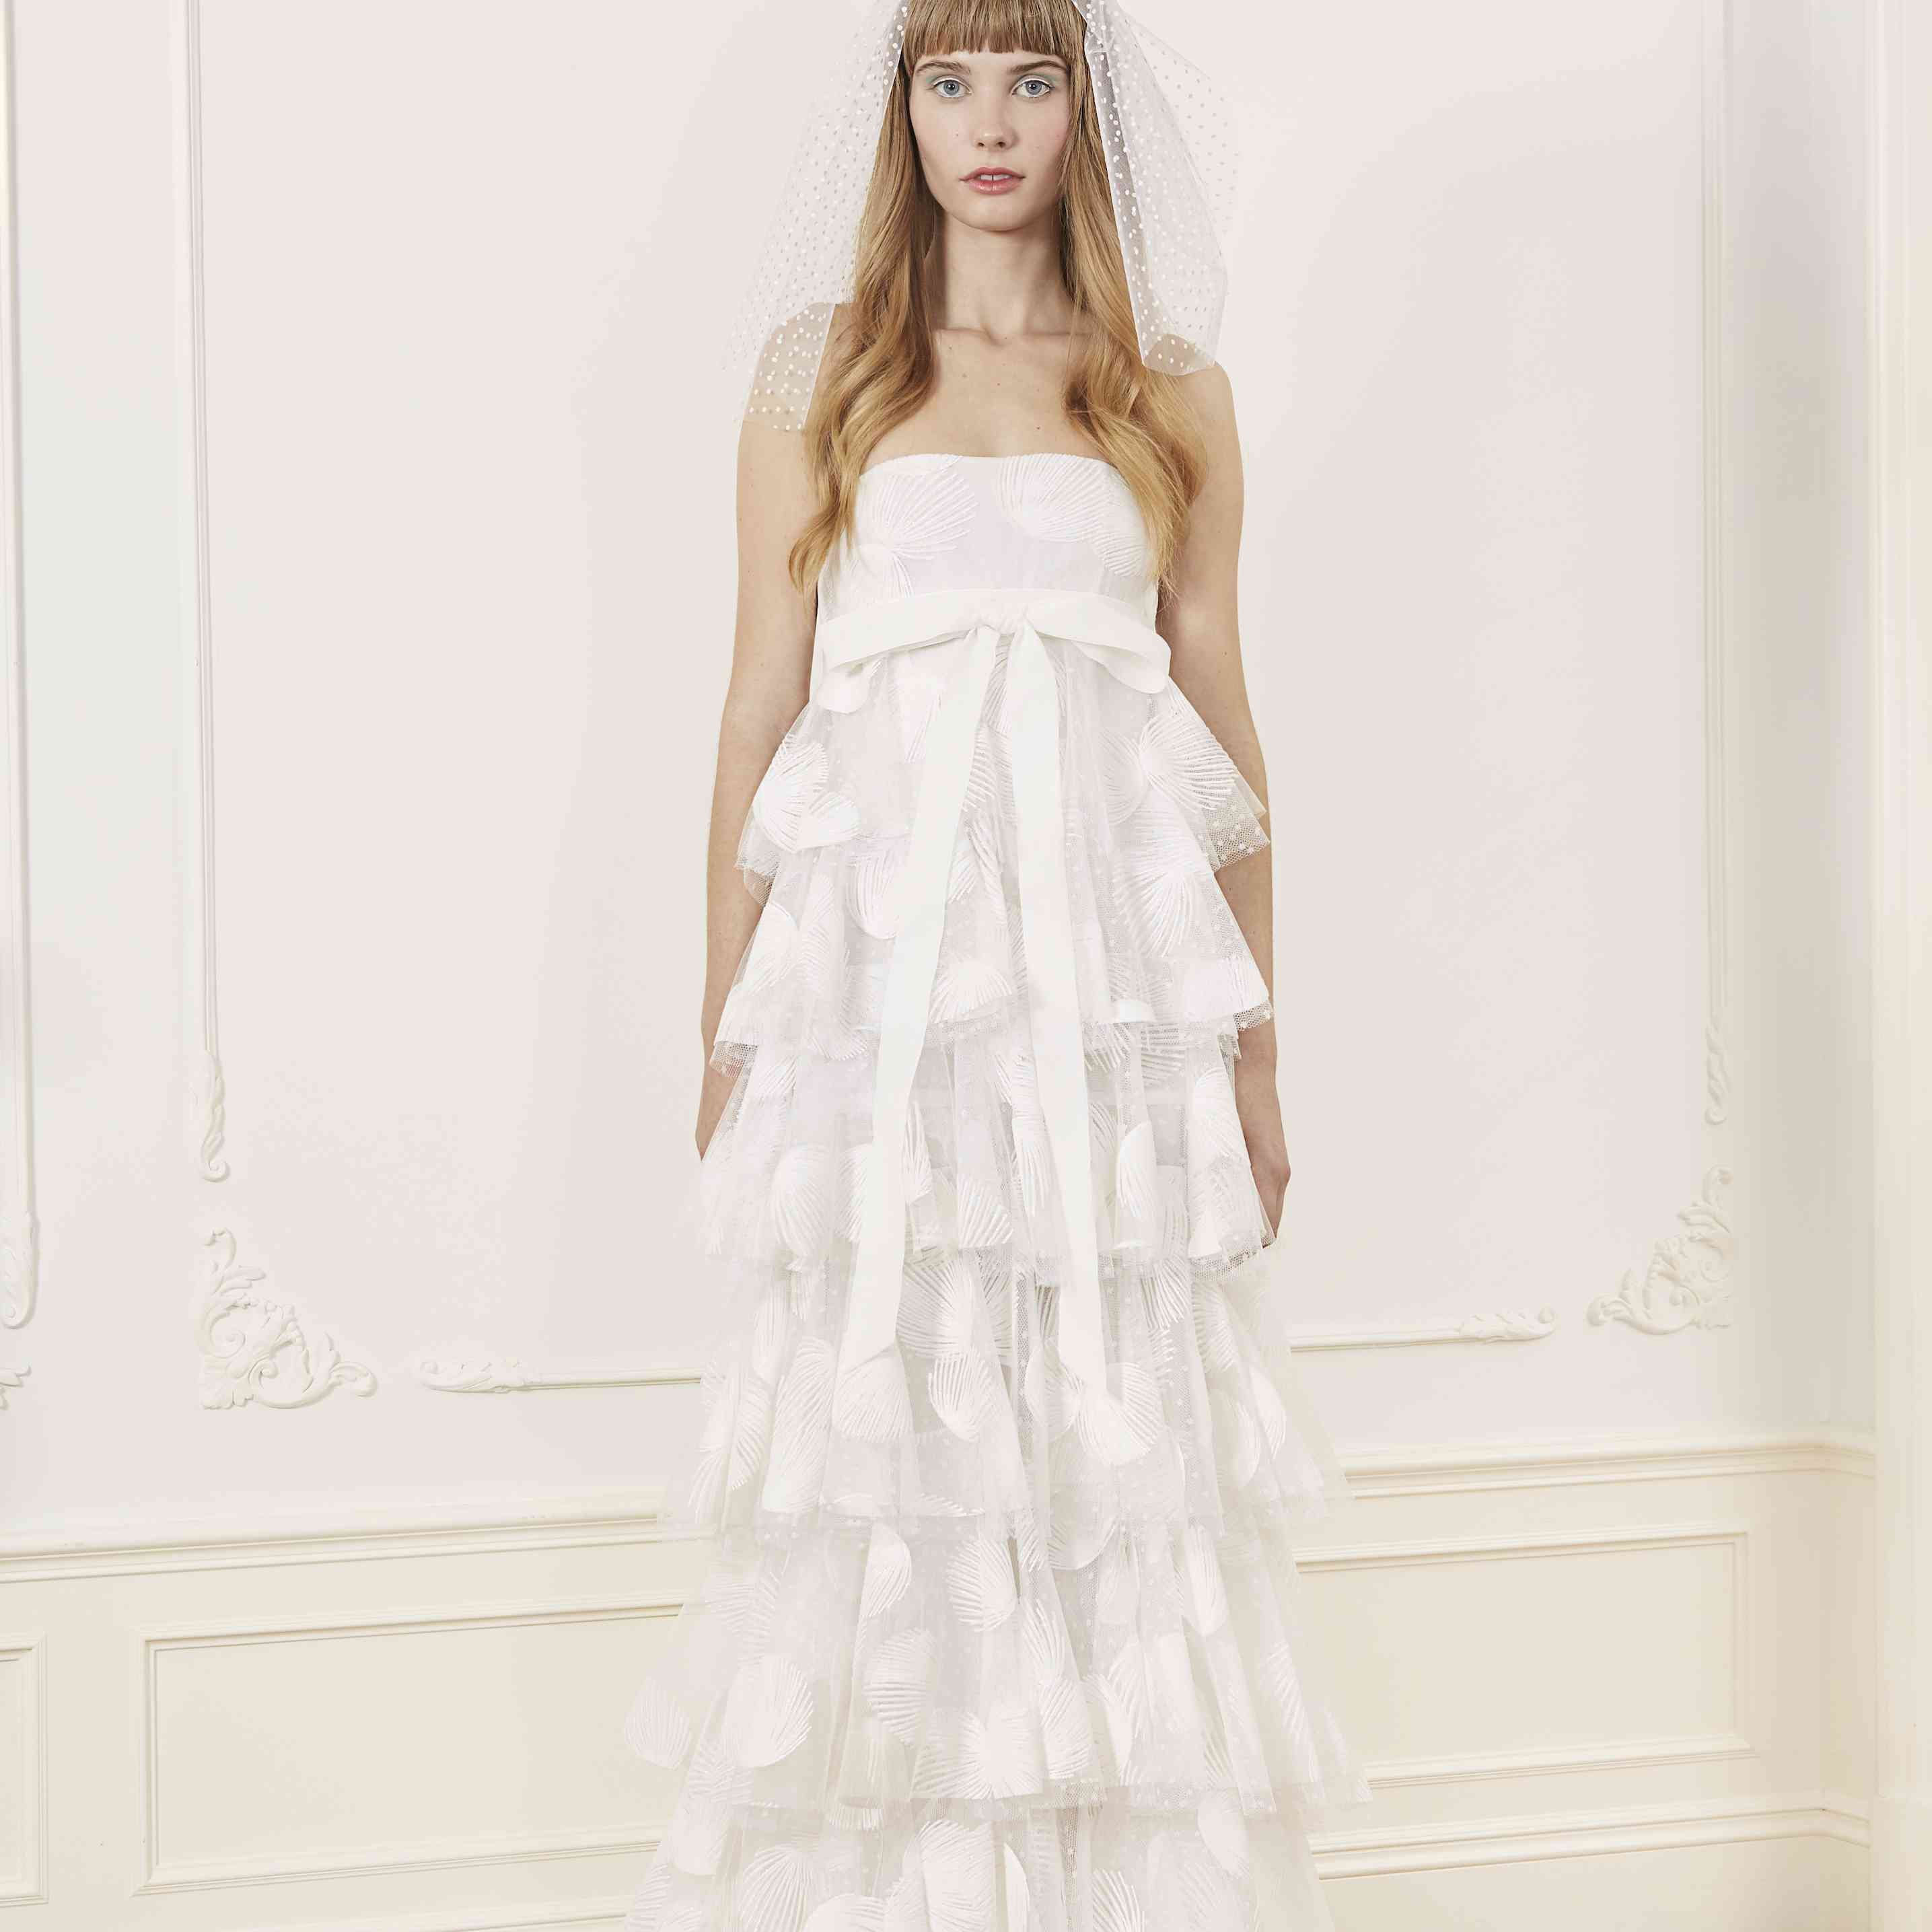 Model in tiered strapless wedding dress